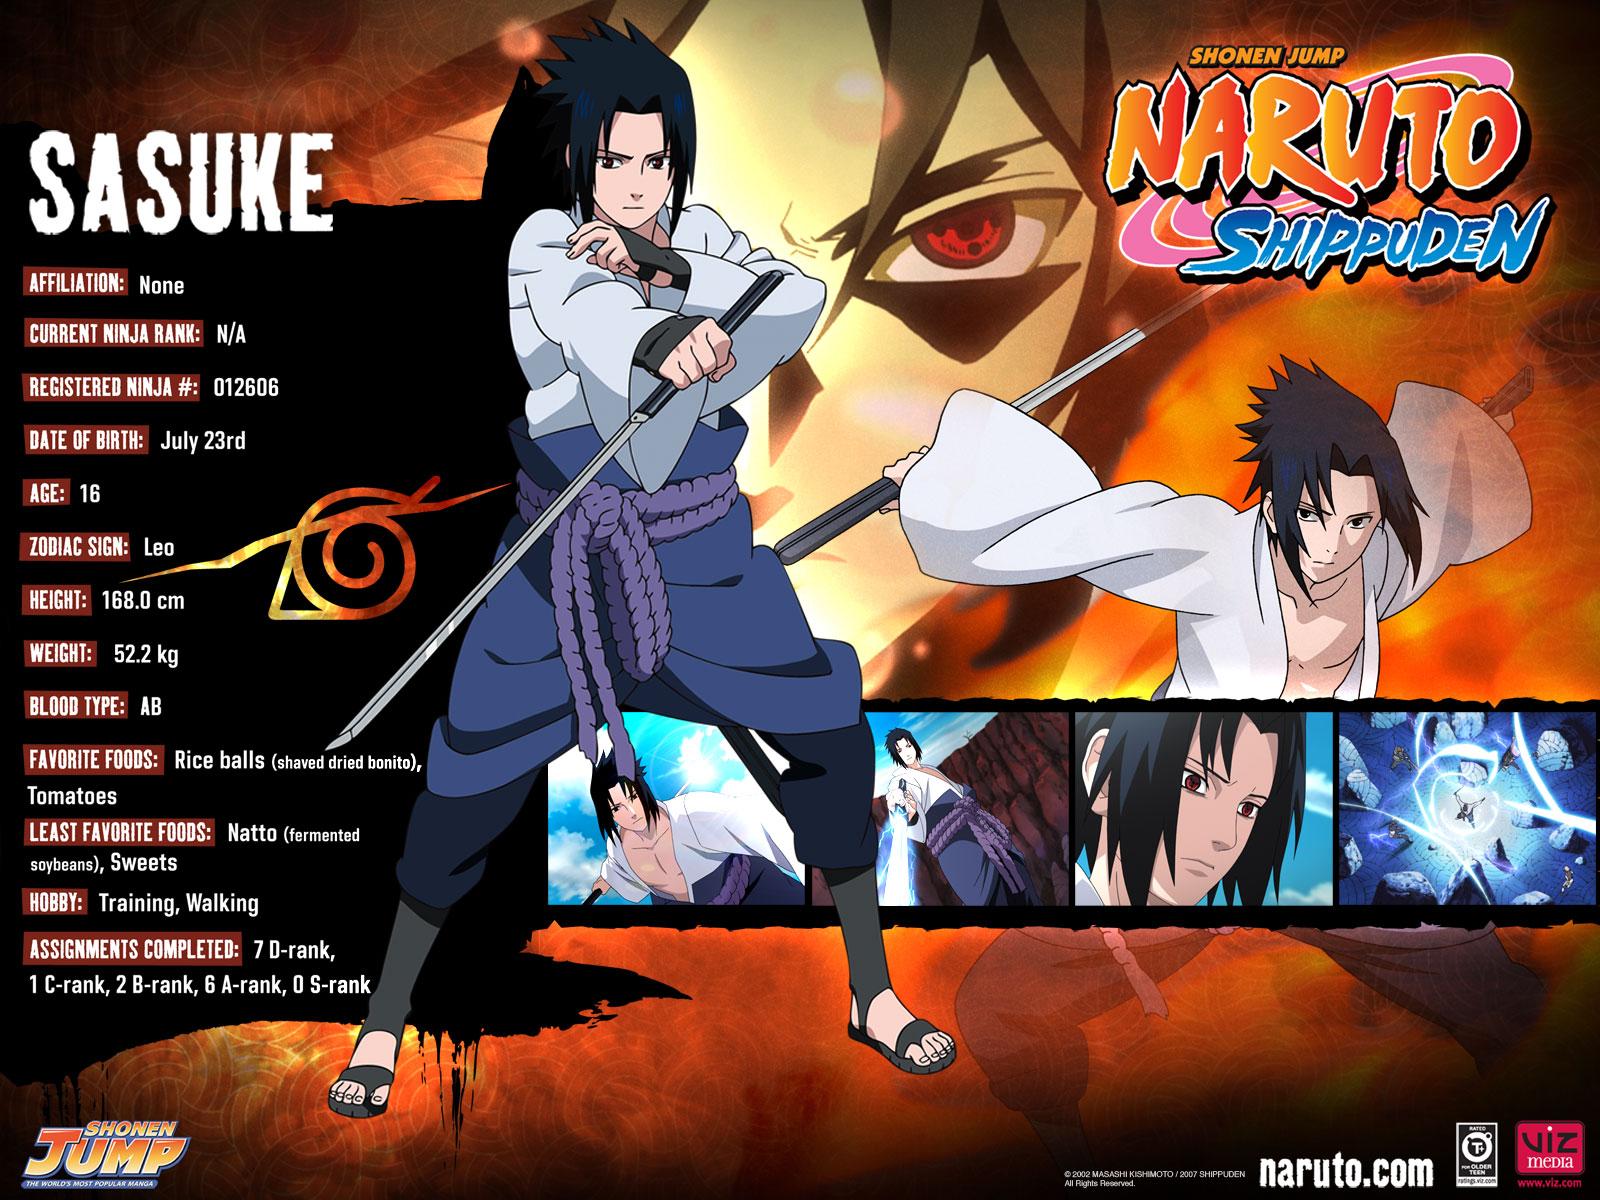 Cool Wallpaper Naruto Deviantart - Wallpaper-Naruto-Shippuden-025  Pictures_25379.jpg